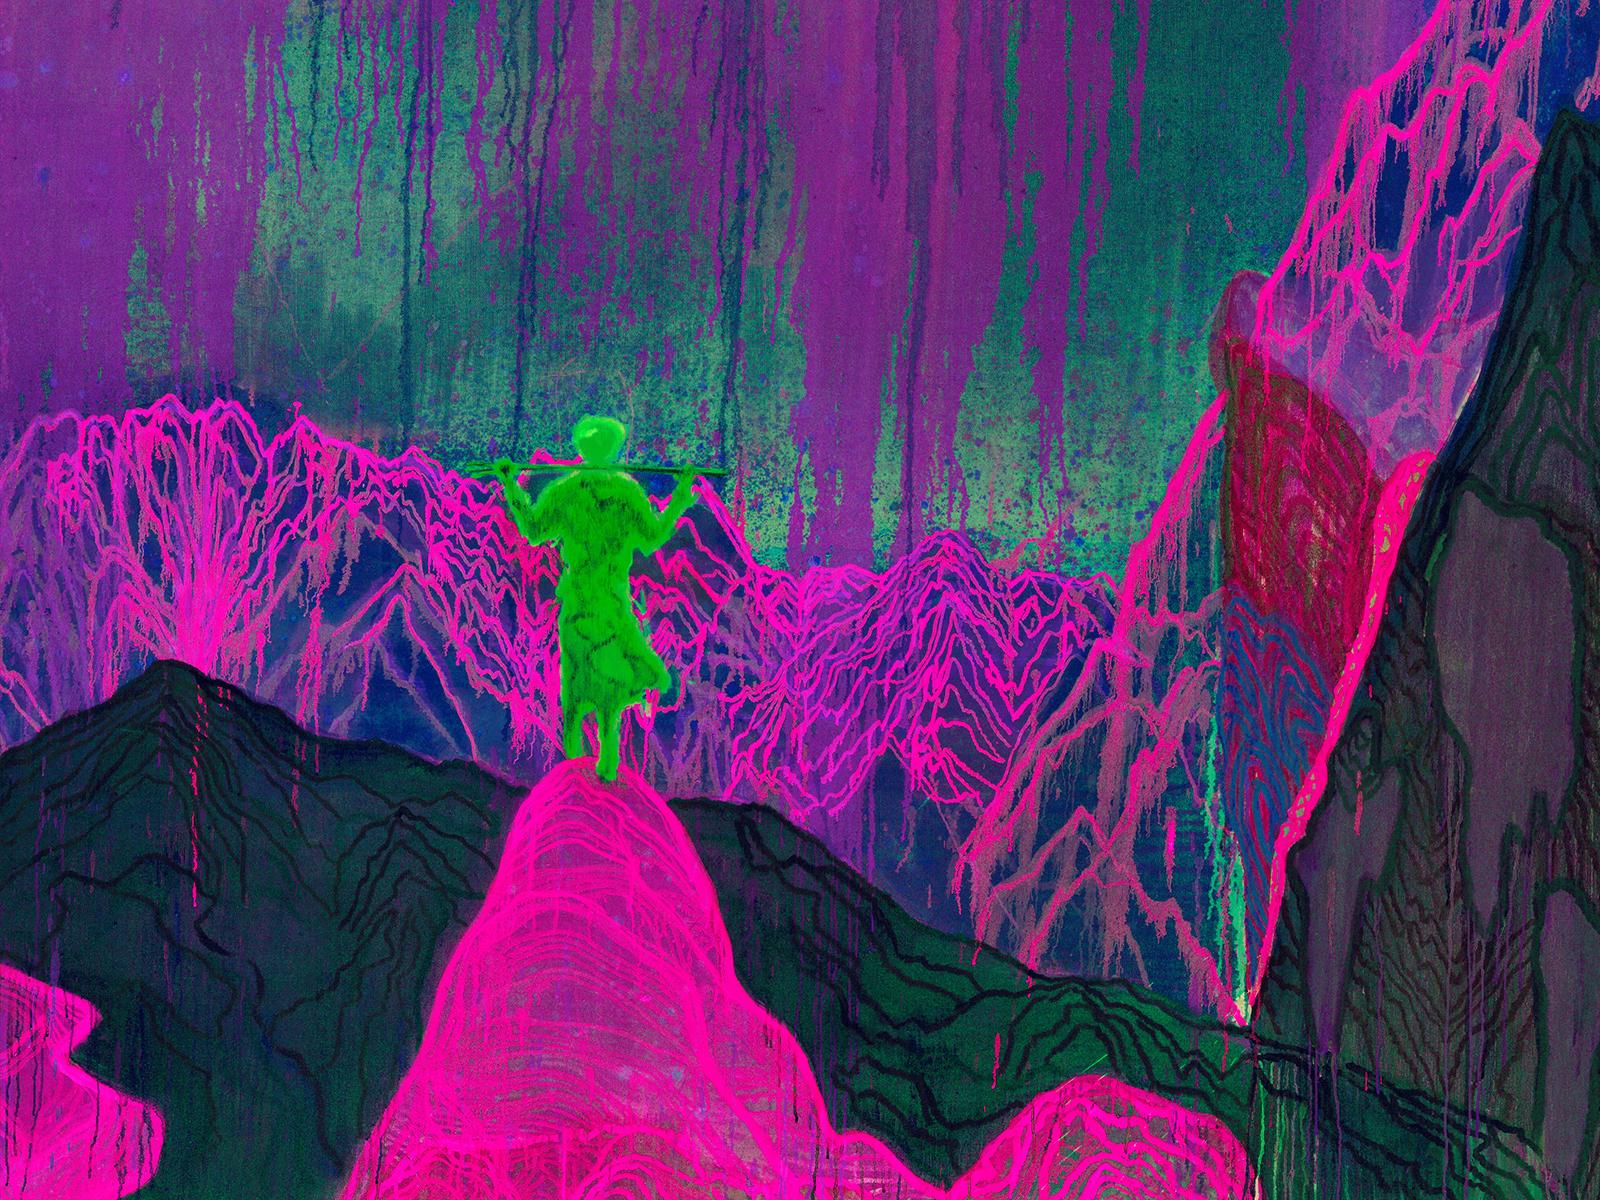 Album der Woche: Dinosaur Jr. – Give A Glimpse Of What Yer Not